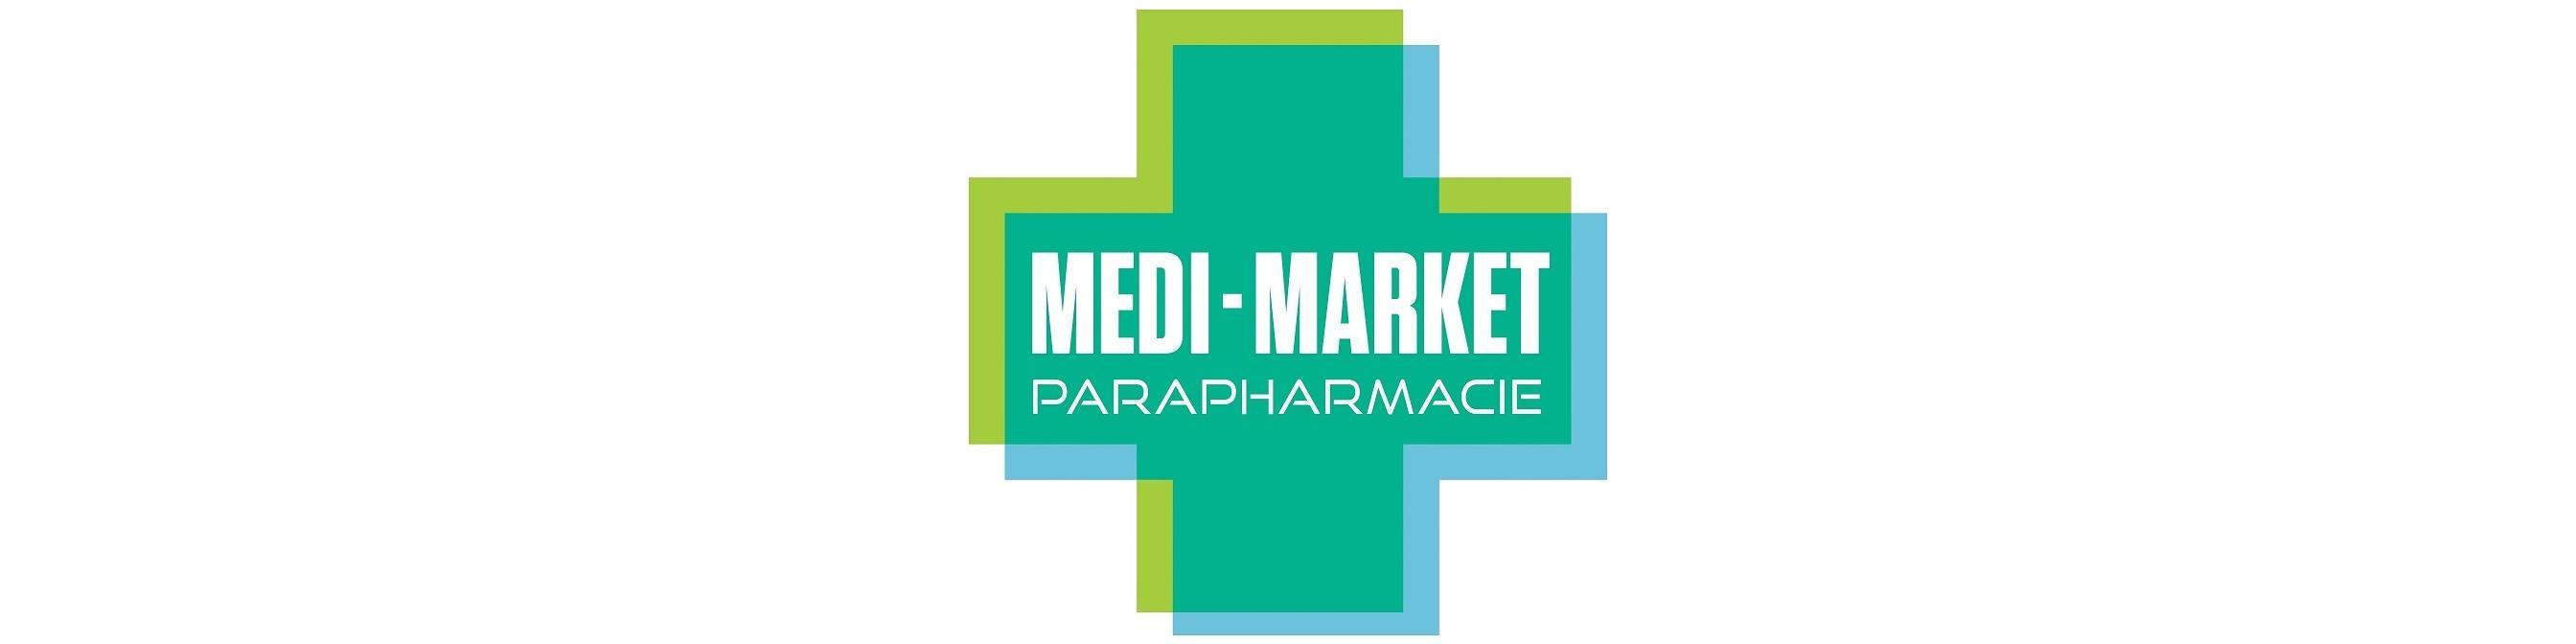 Medi-Market Webshop (FR)- Logo - Avis